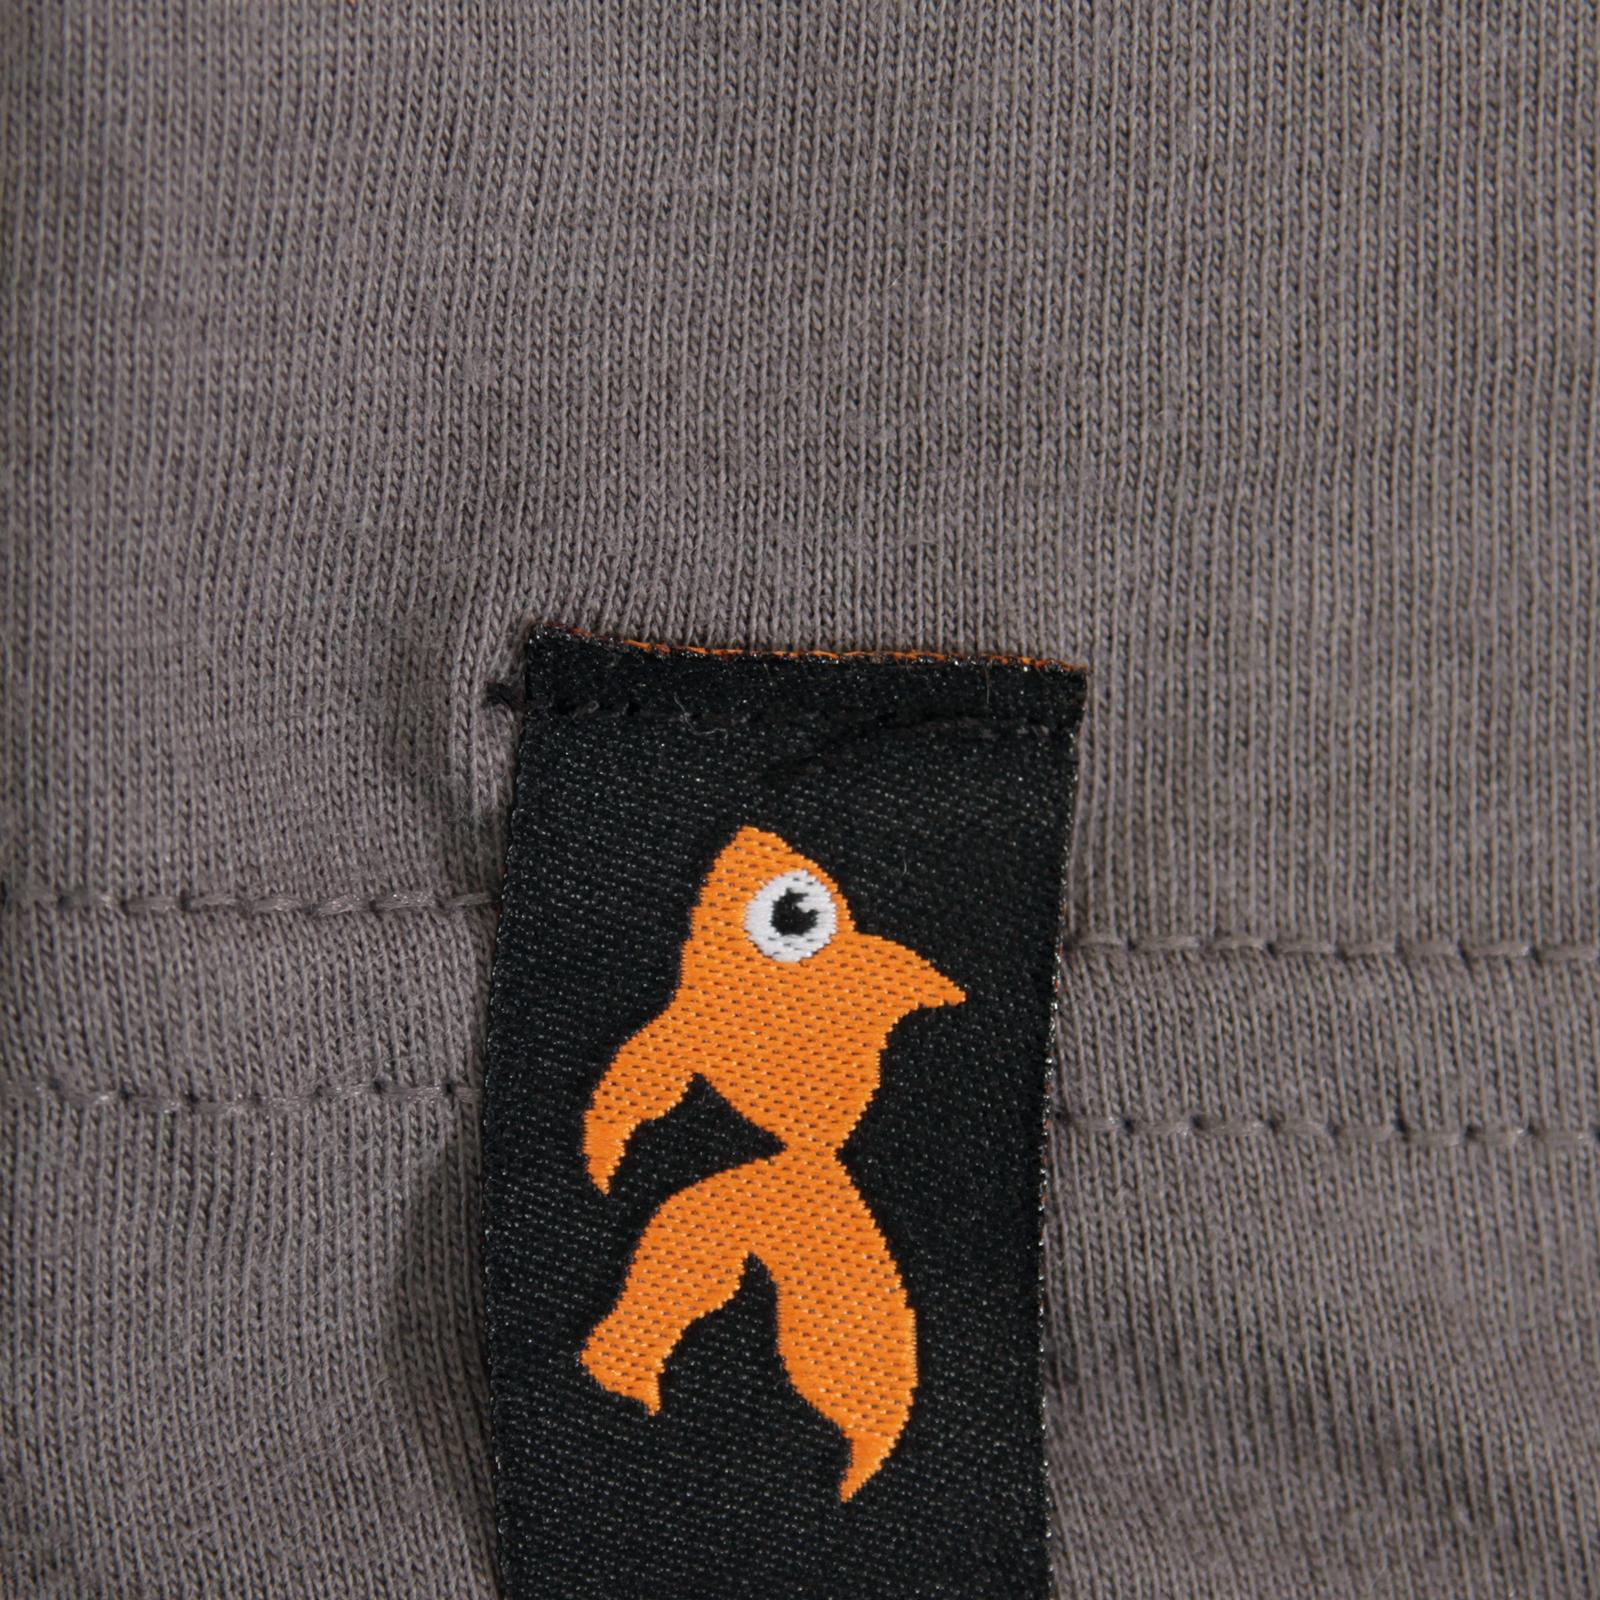 Goldfish Asphalt Camo Pocket Tee